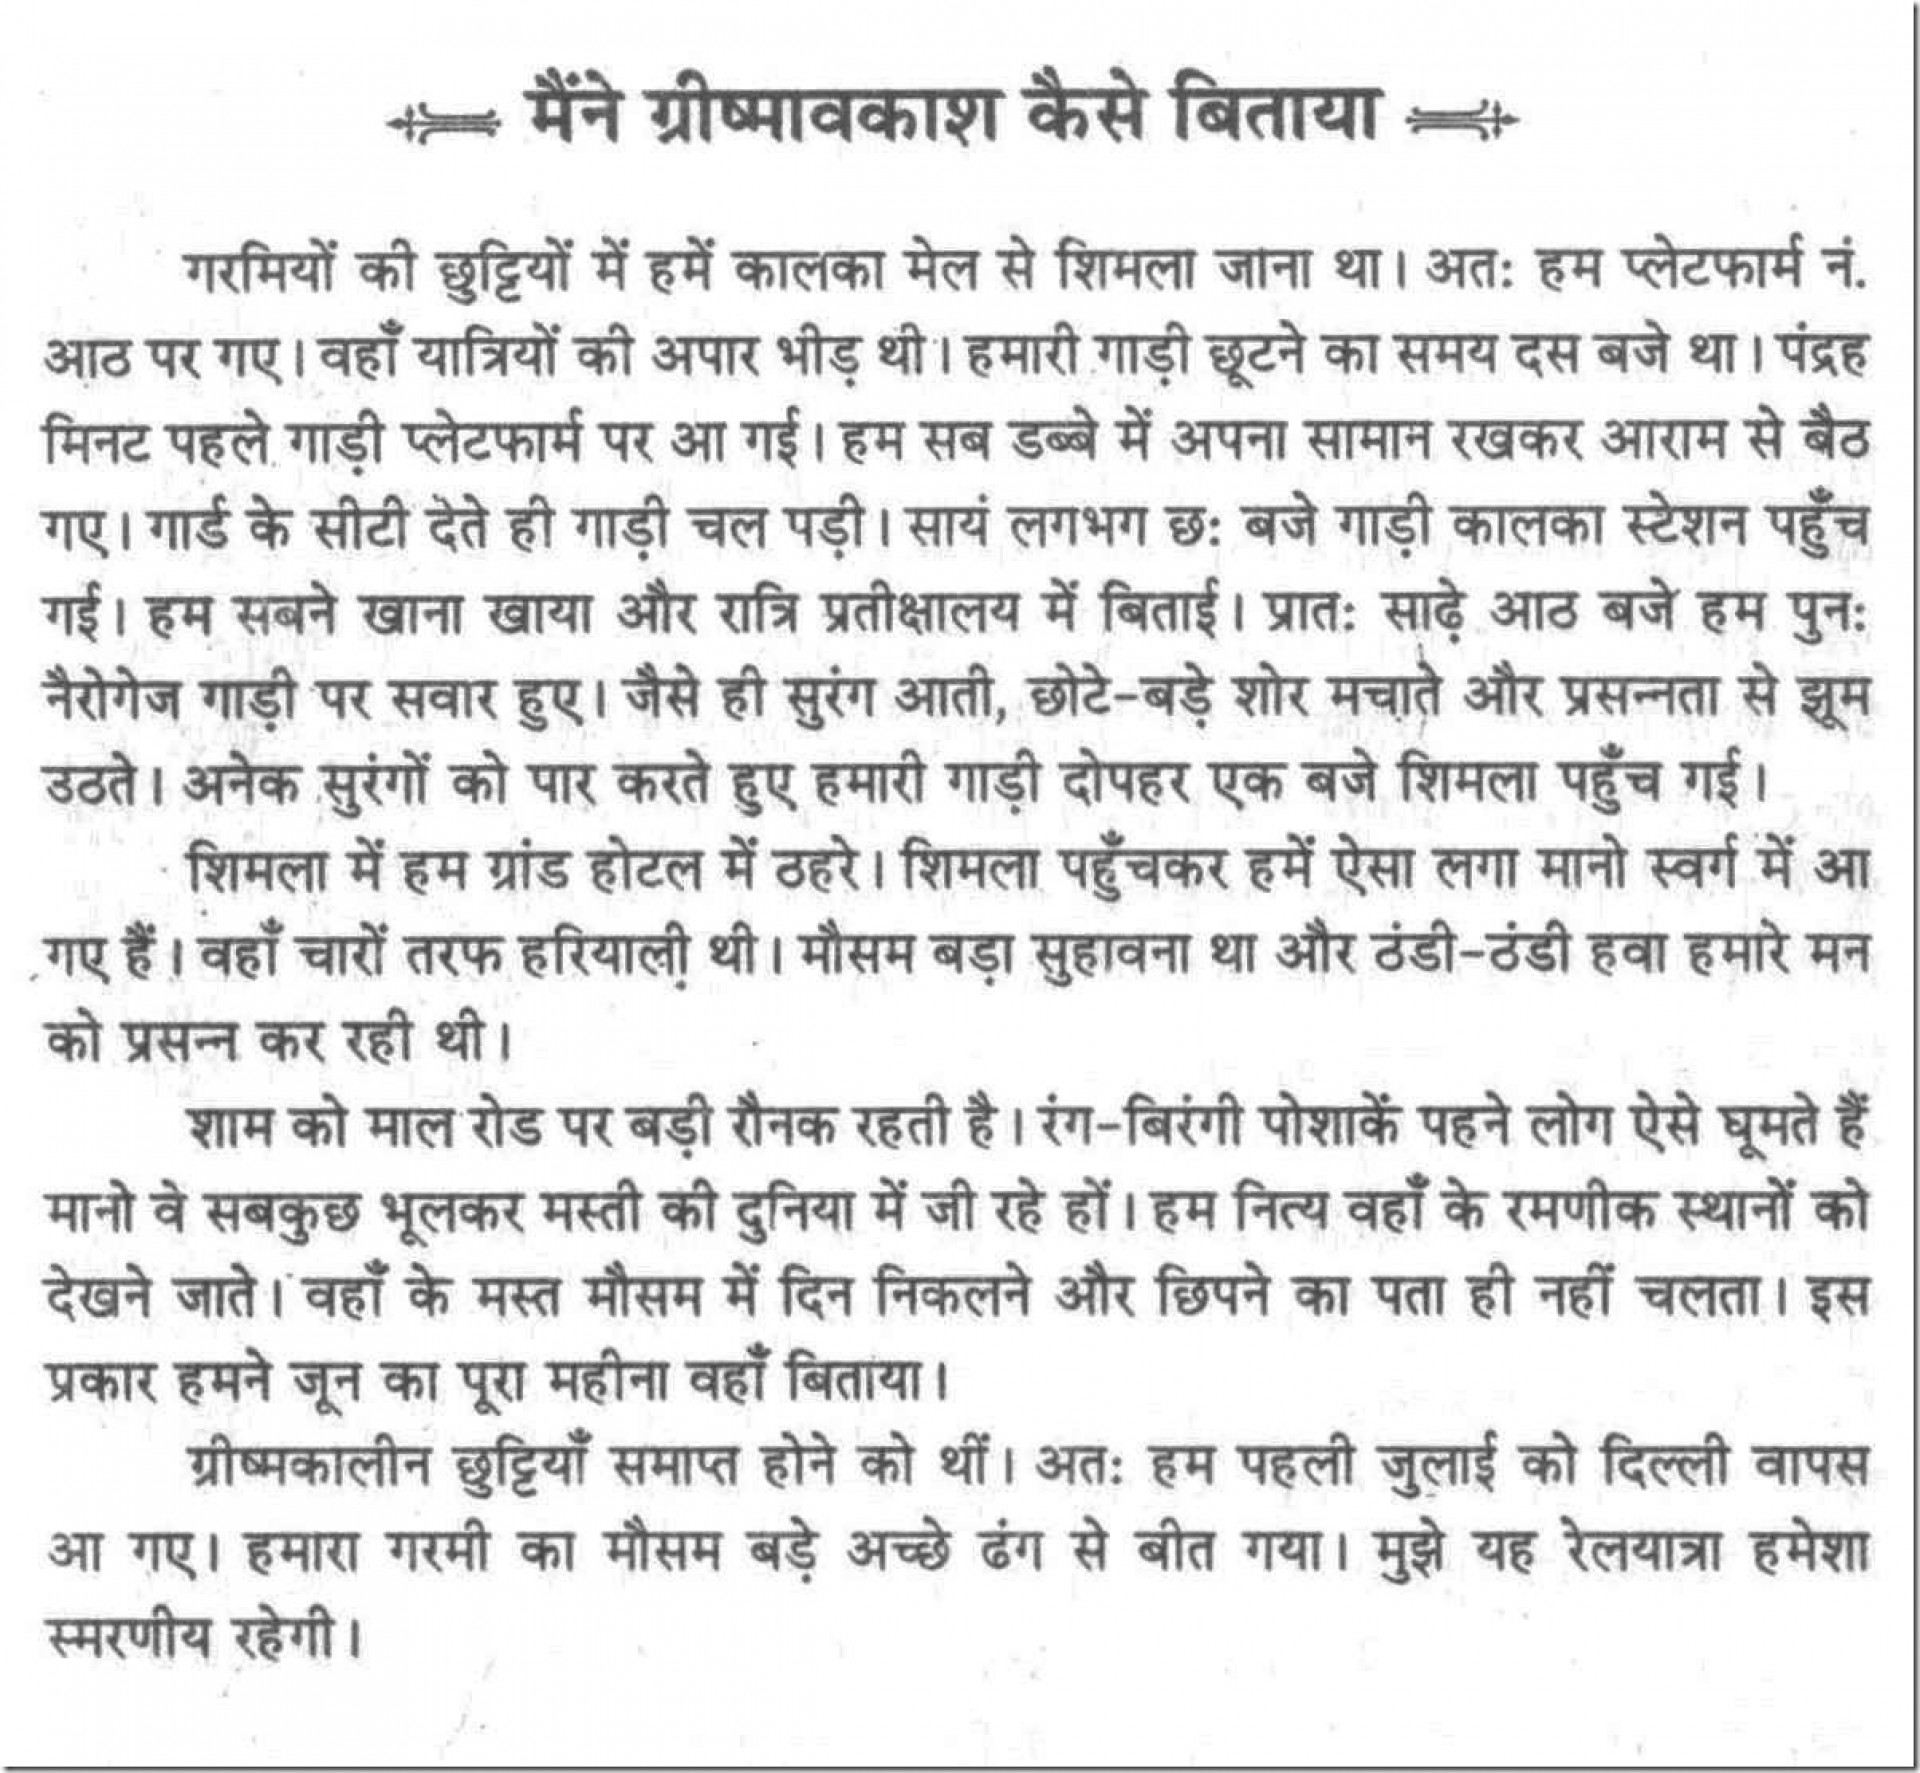 005 Summer Vacation Essay 1000135 Thumb Frightening For Class 6 In Urdu On Marathi 1920